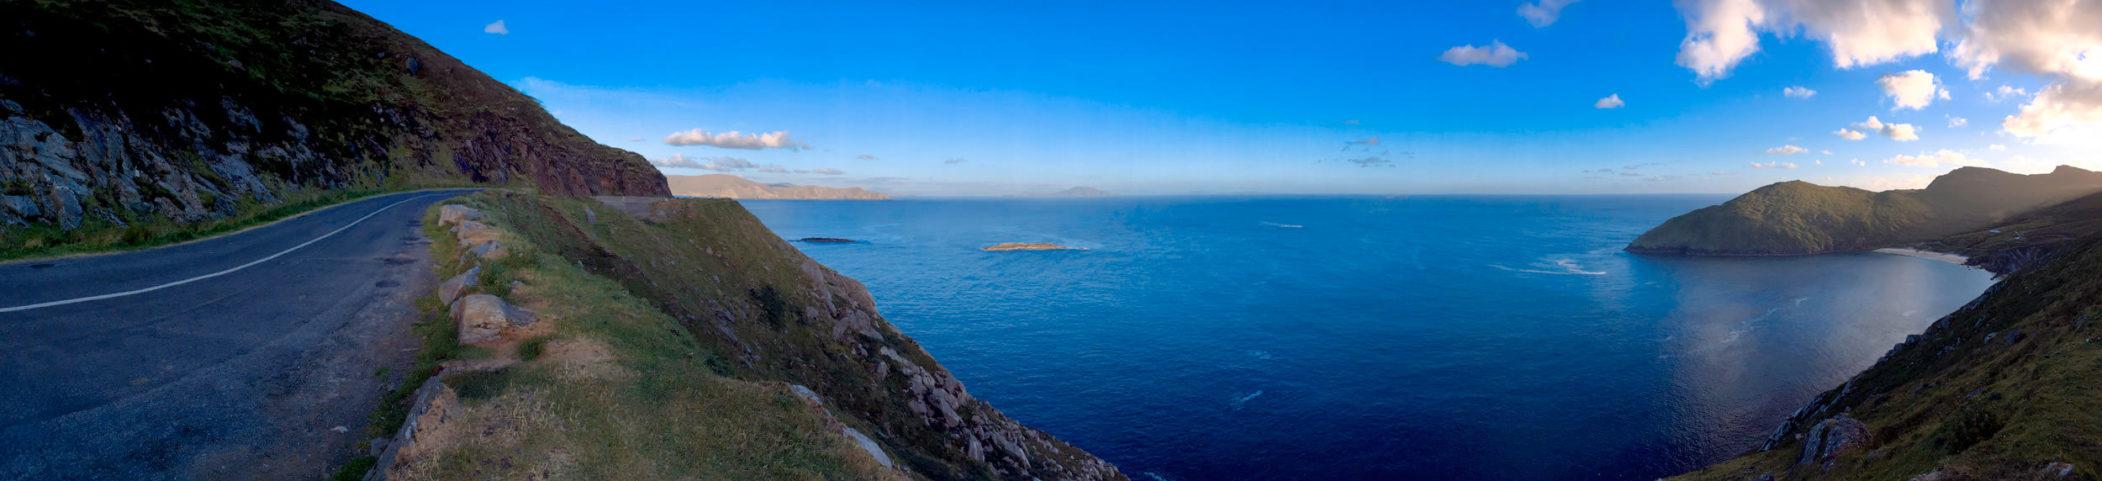 Panorama Keem bay